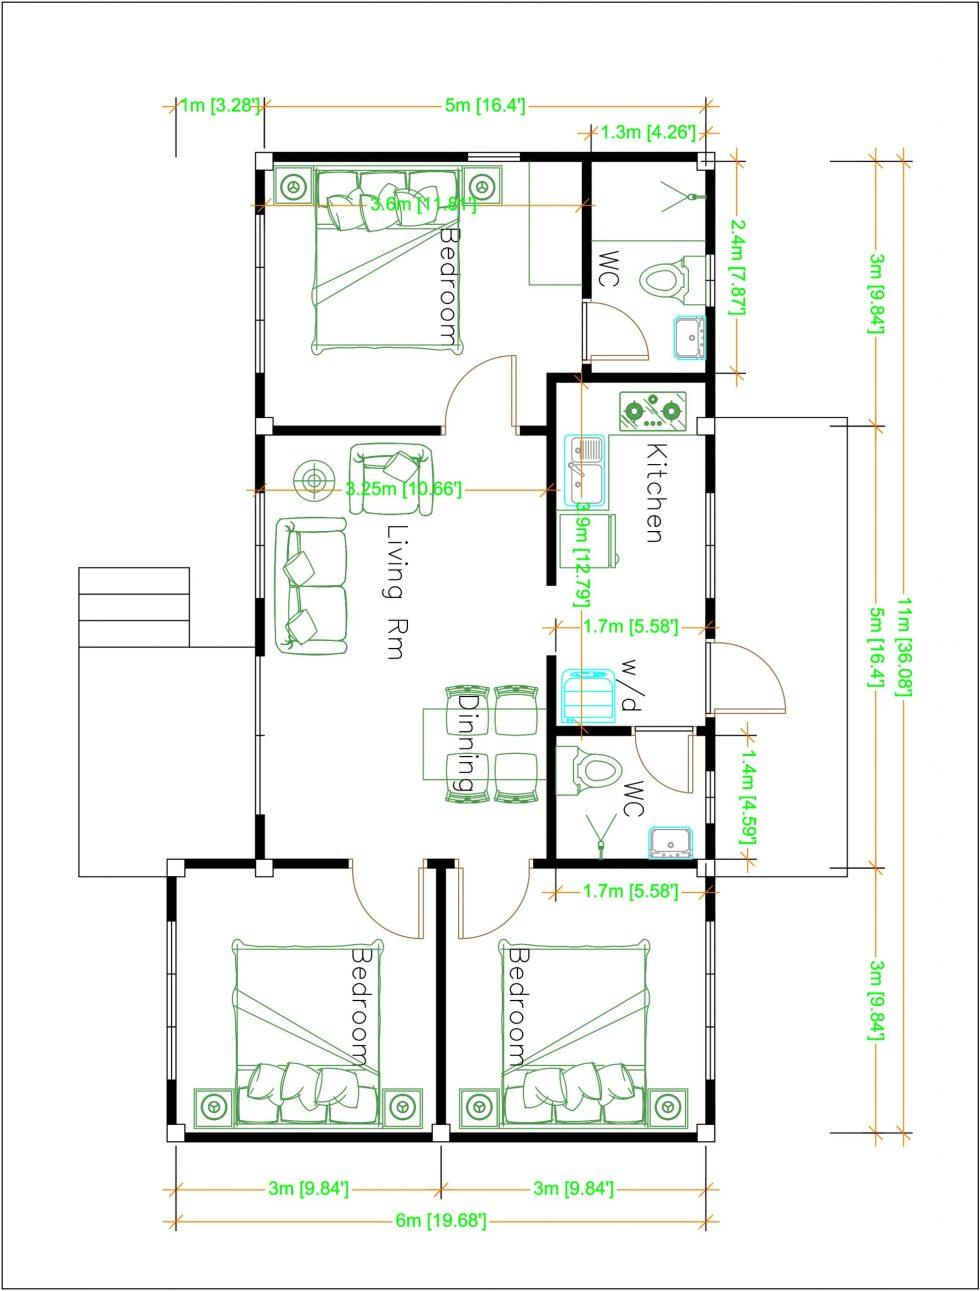 House Design Plans 11x6 Meters 36x20 Feet Hip Roof Samhouseplans,Light Medium Chocolate Brown Hair Color